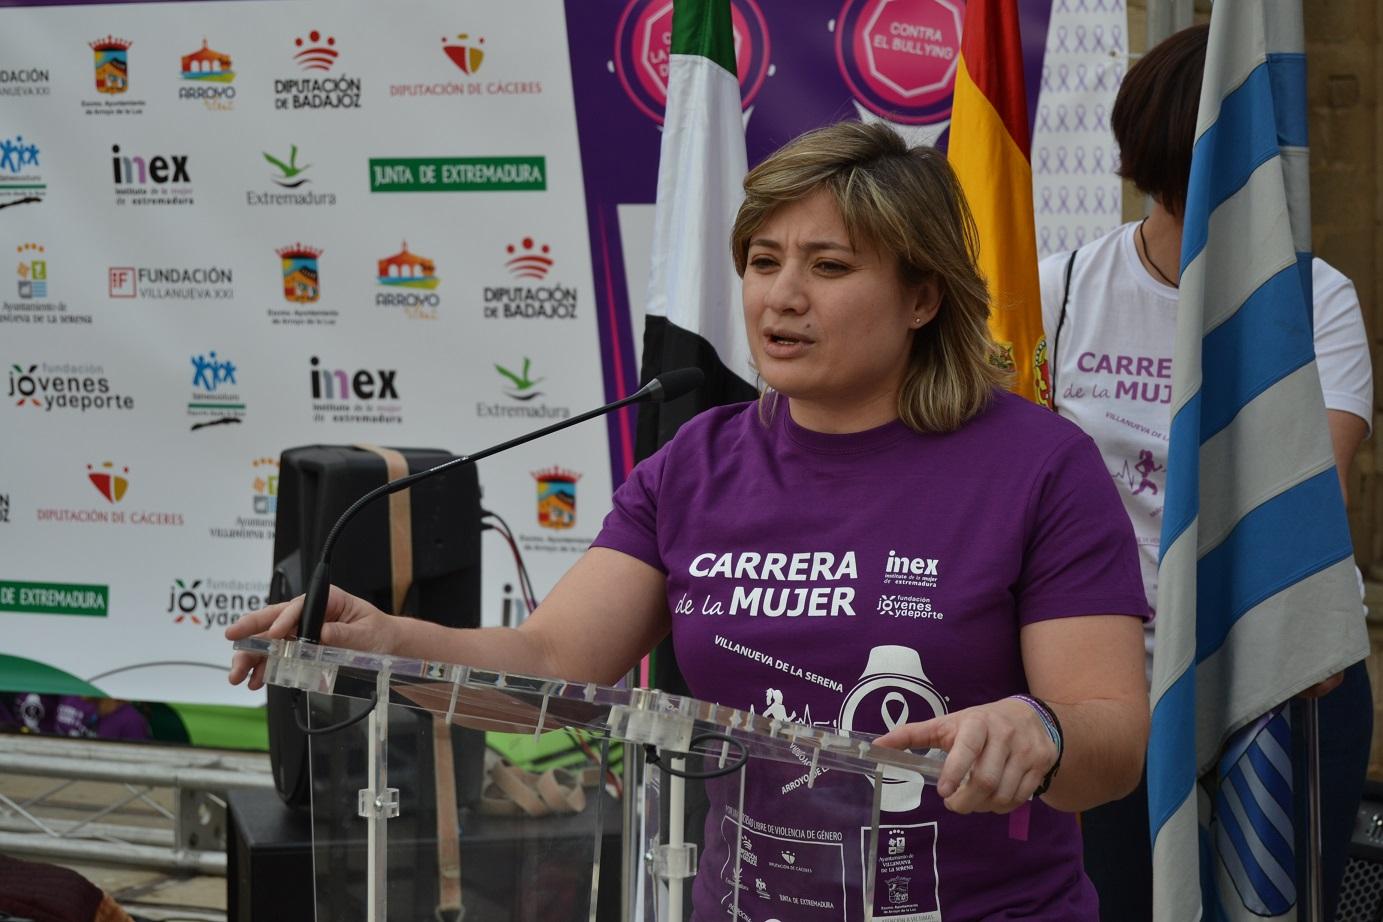 directora general de Deportes, Conchi Bellorín - Carrera de la Mujer 2017 de Villanueva de la Serena